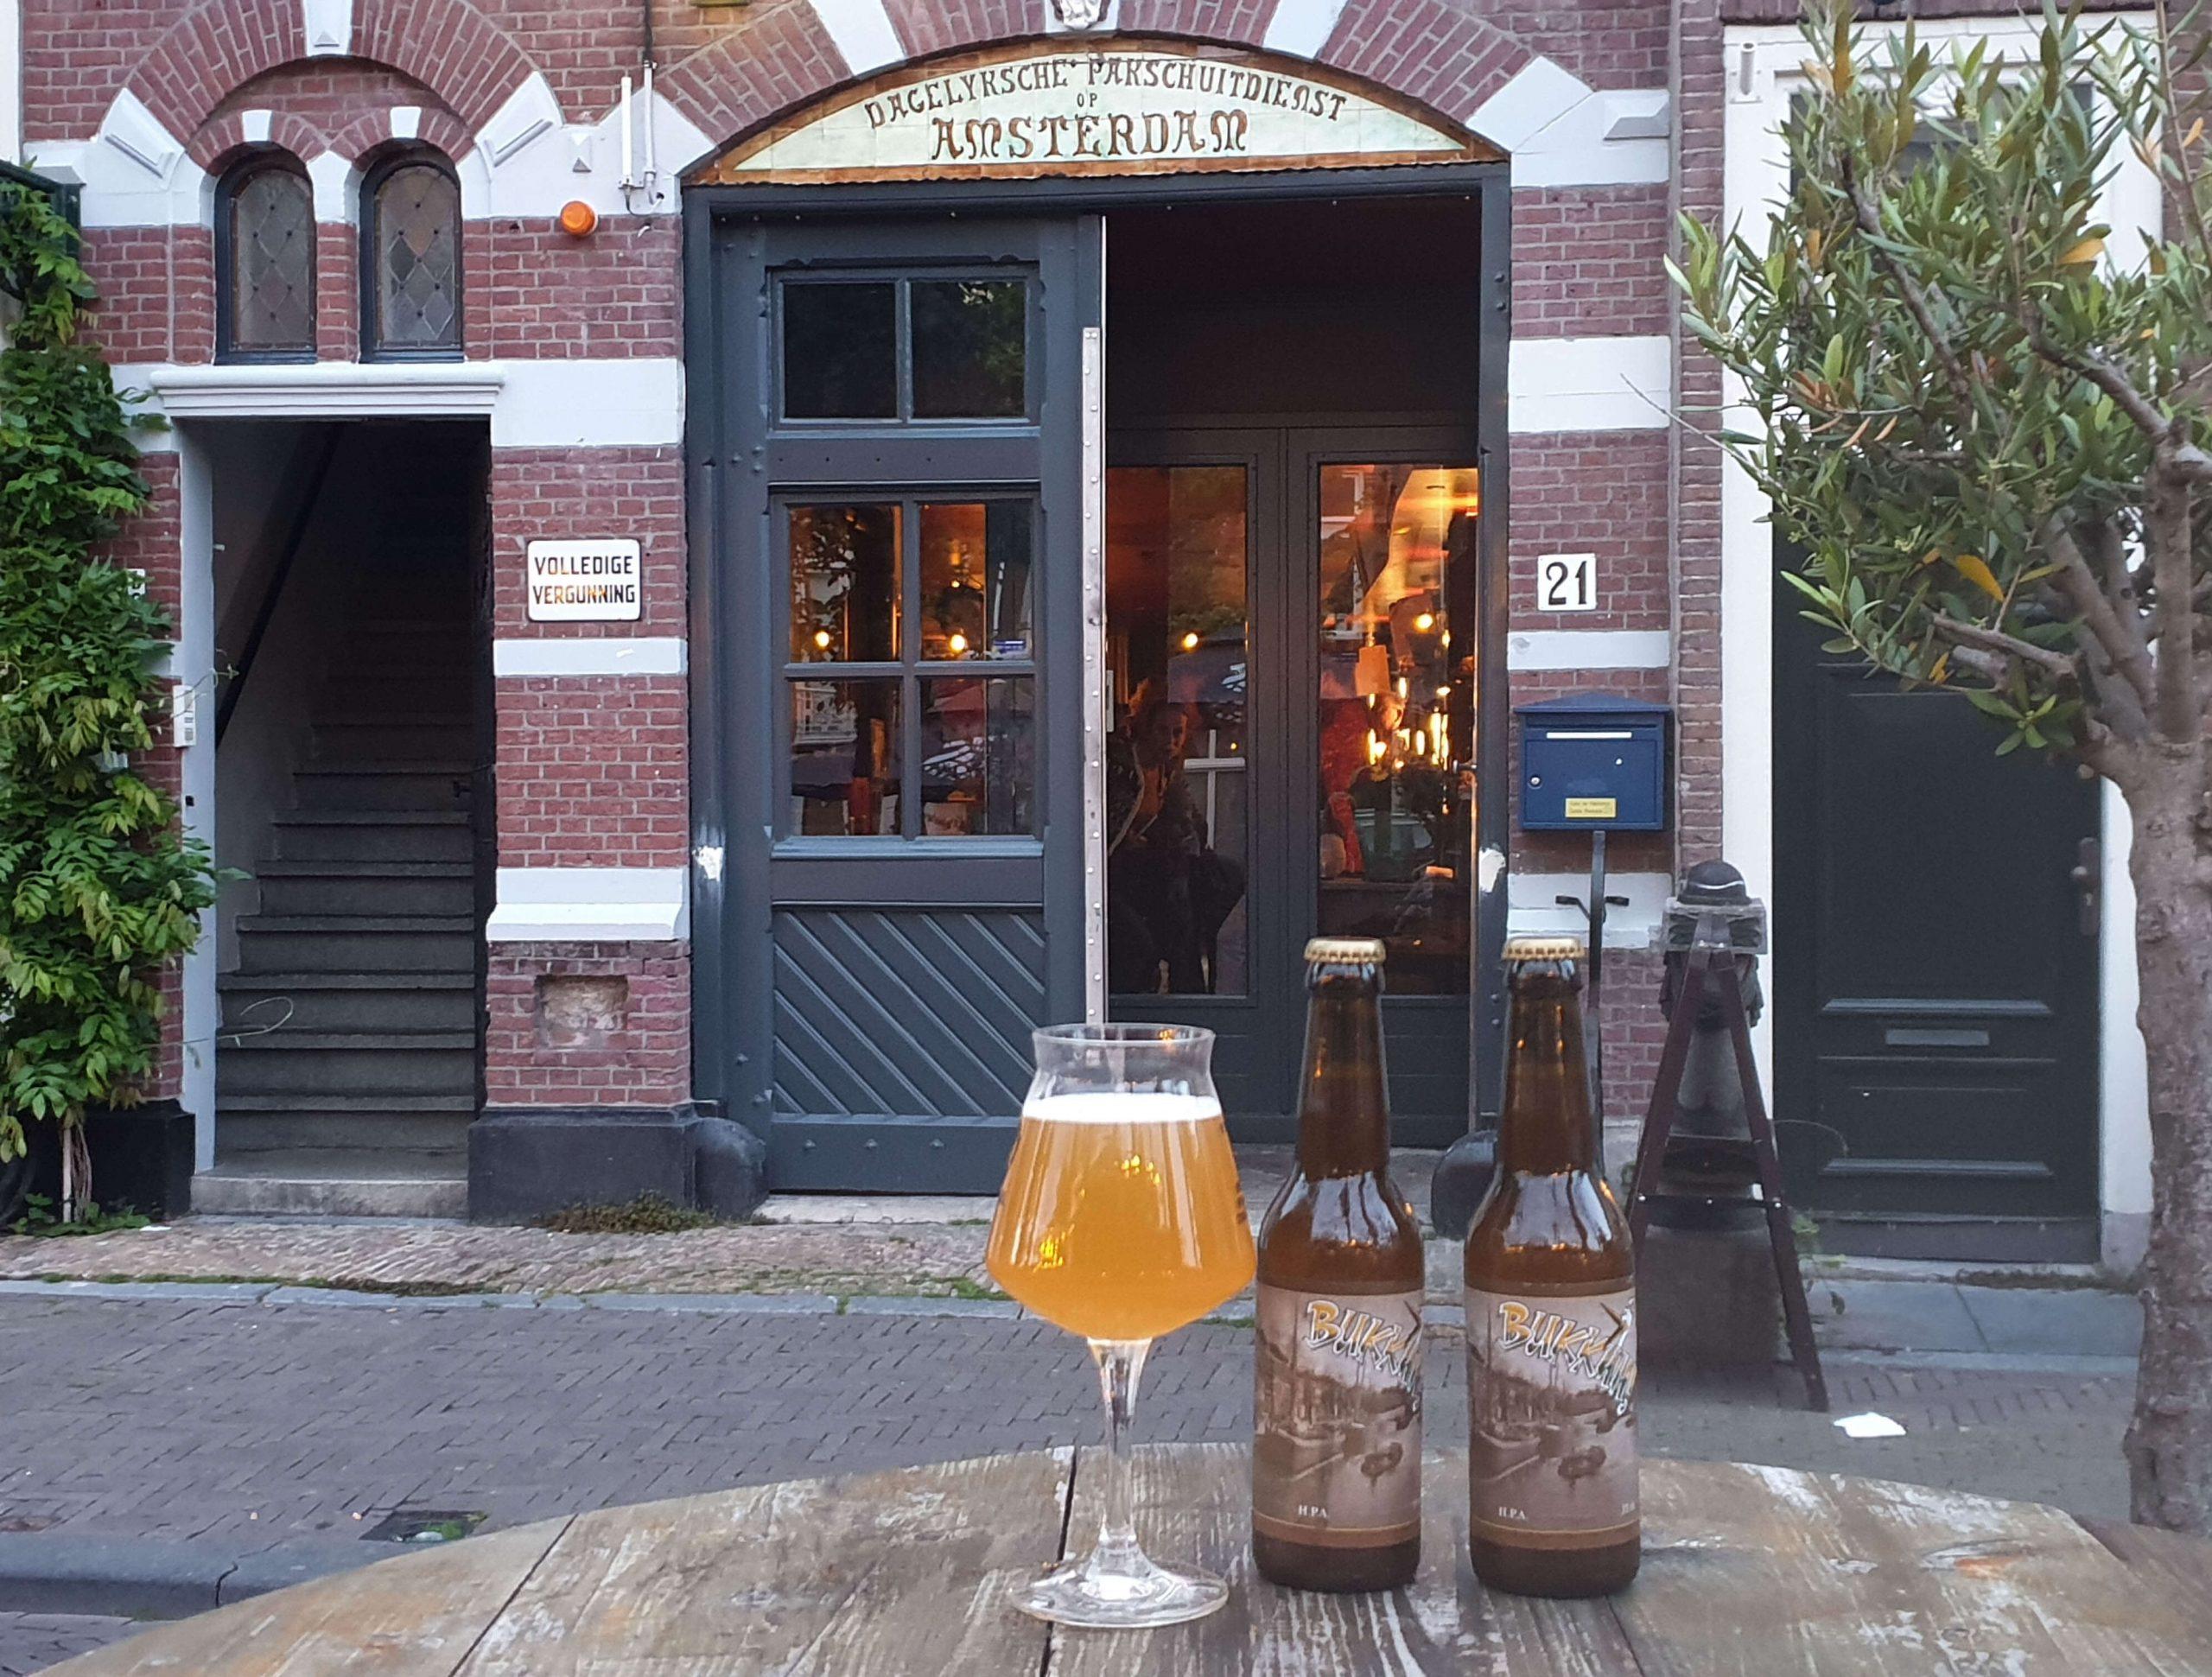 Lokaal shoppen in Den Haag